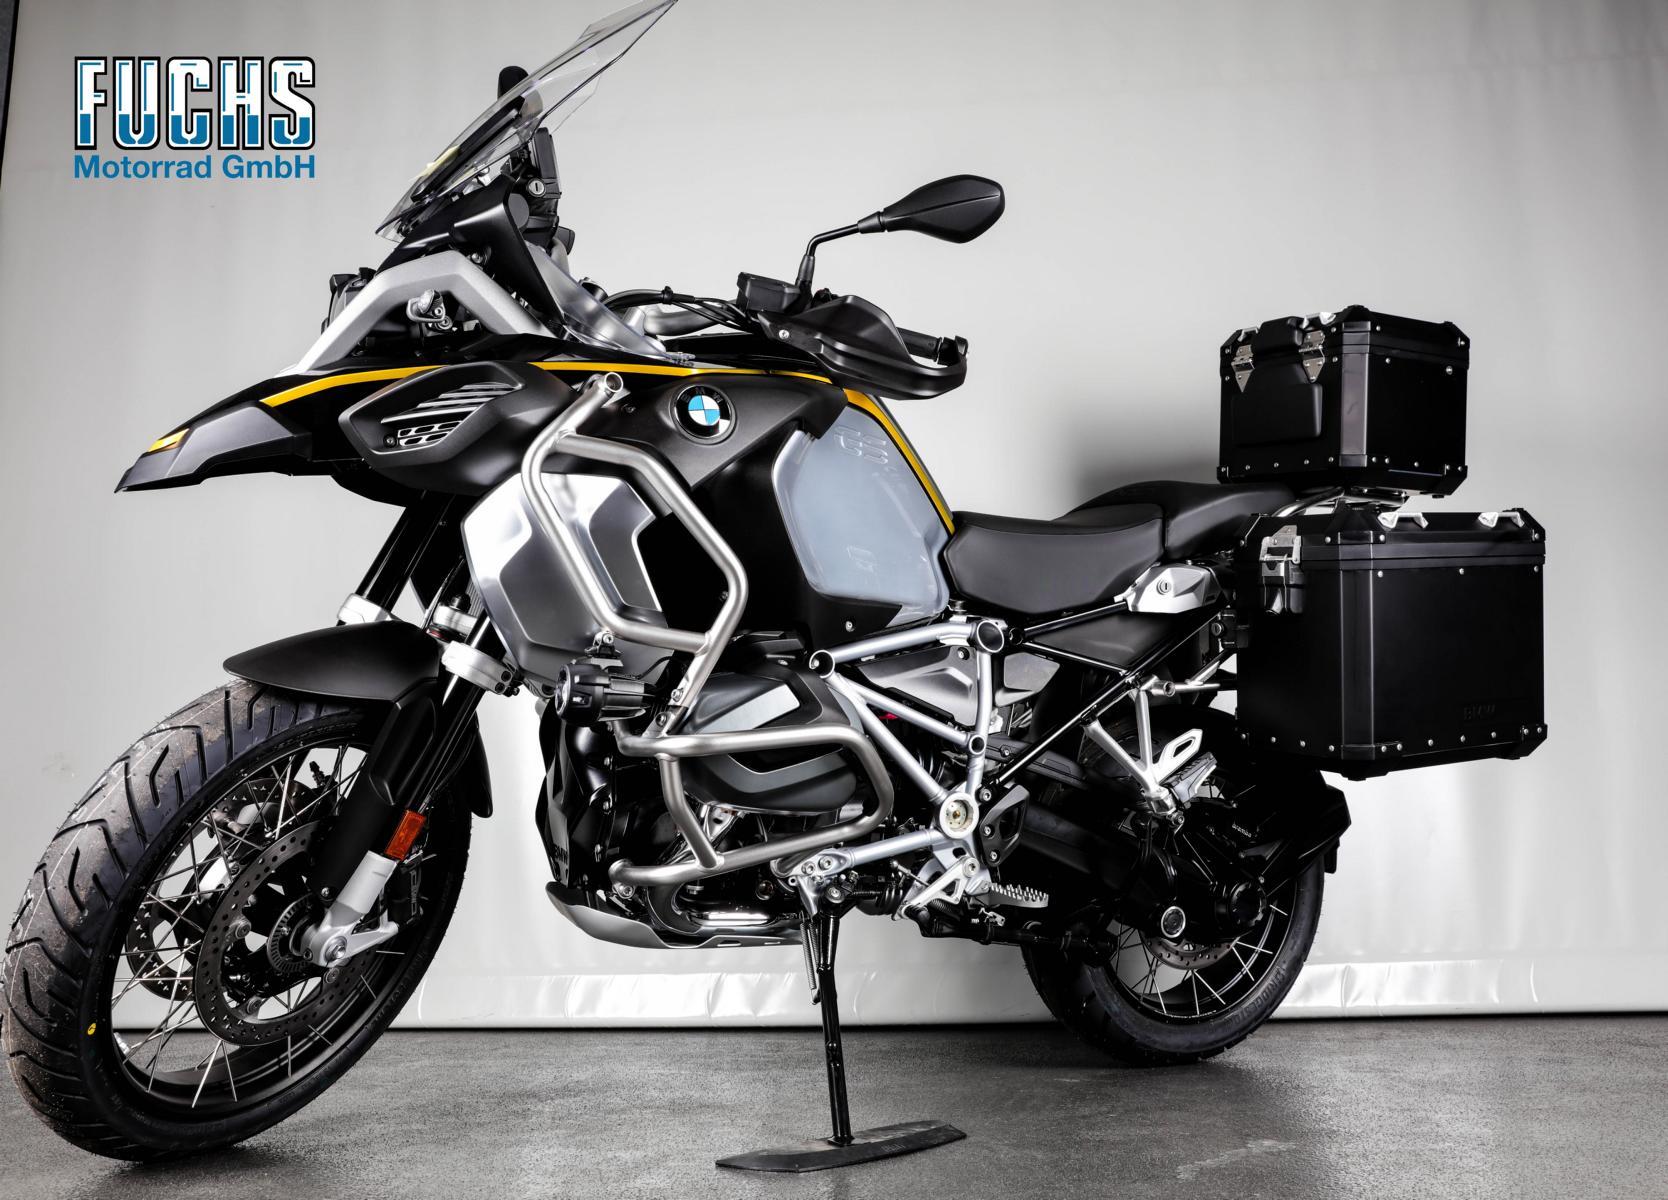 R1250GS ADV Fuchs Edition